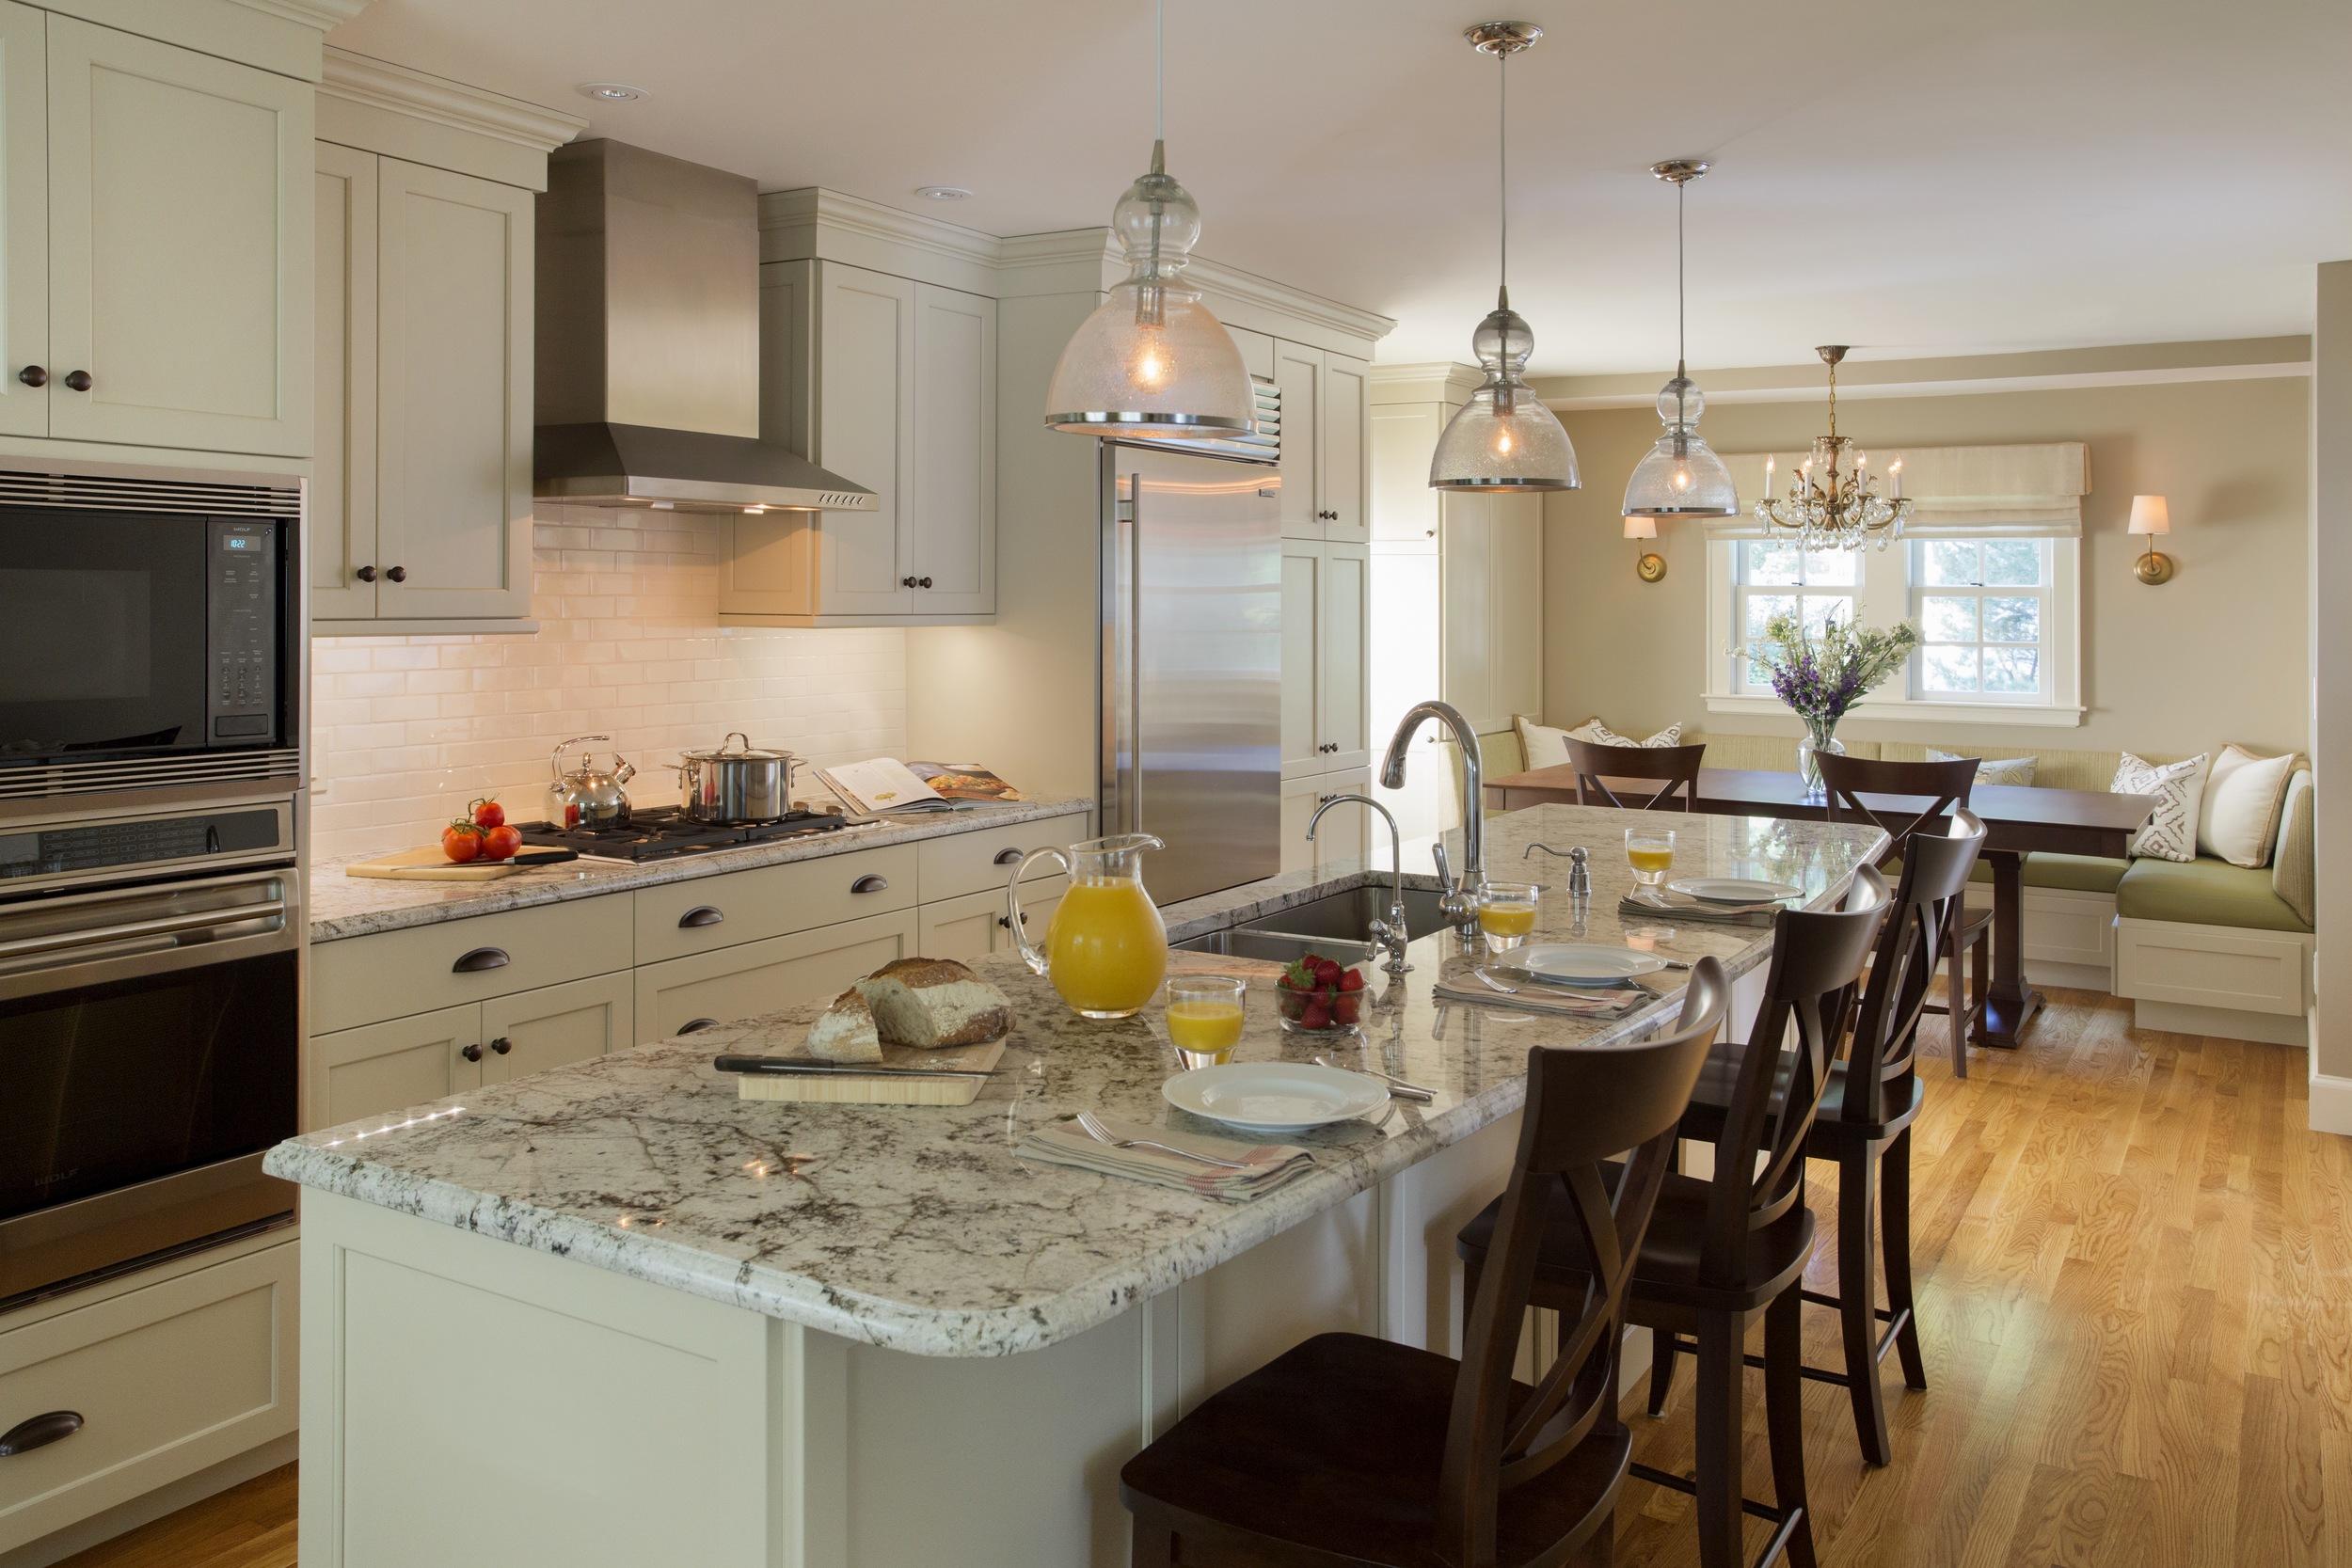 MAIN_Jeff Swanson Wellesley 9 12 kitchen 2.jpg